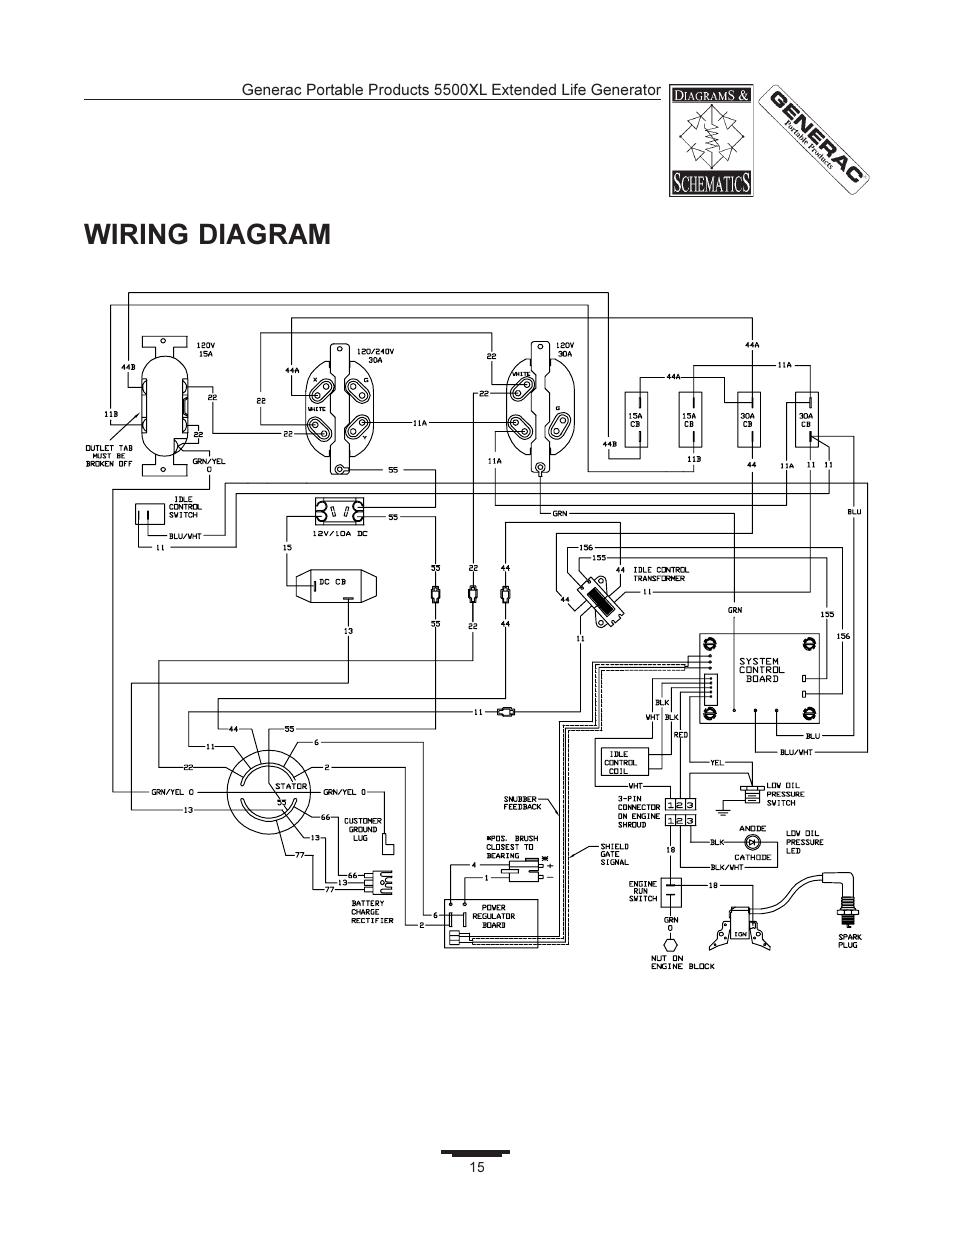 hight resolution of wiring diagram generac 5500xl user manual page 15 18 generac generator wiring schematics generac 005735 wiring manuals